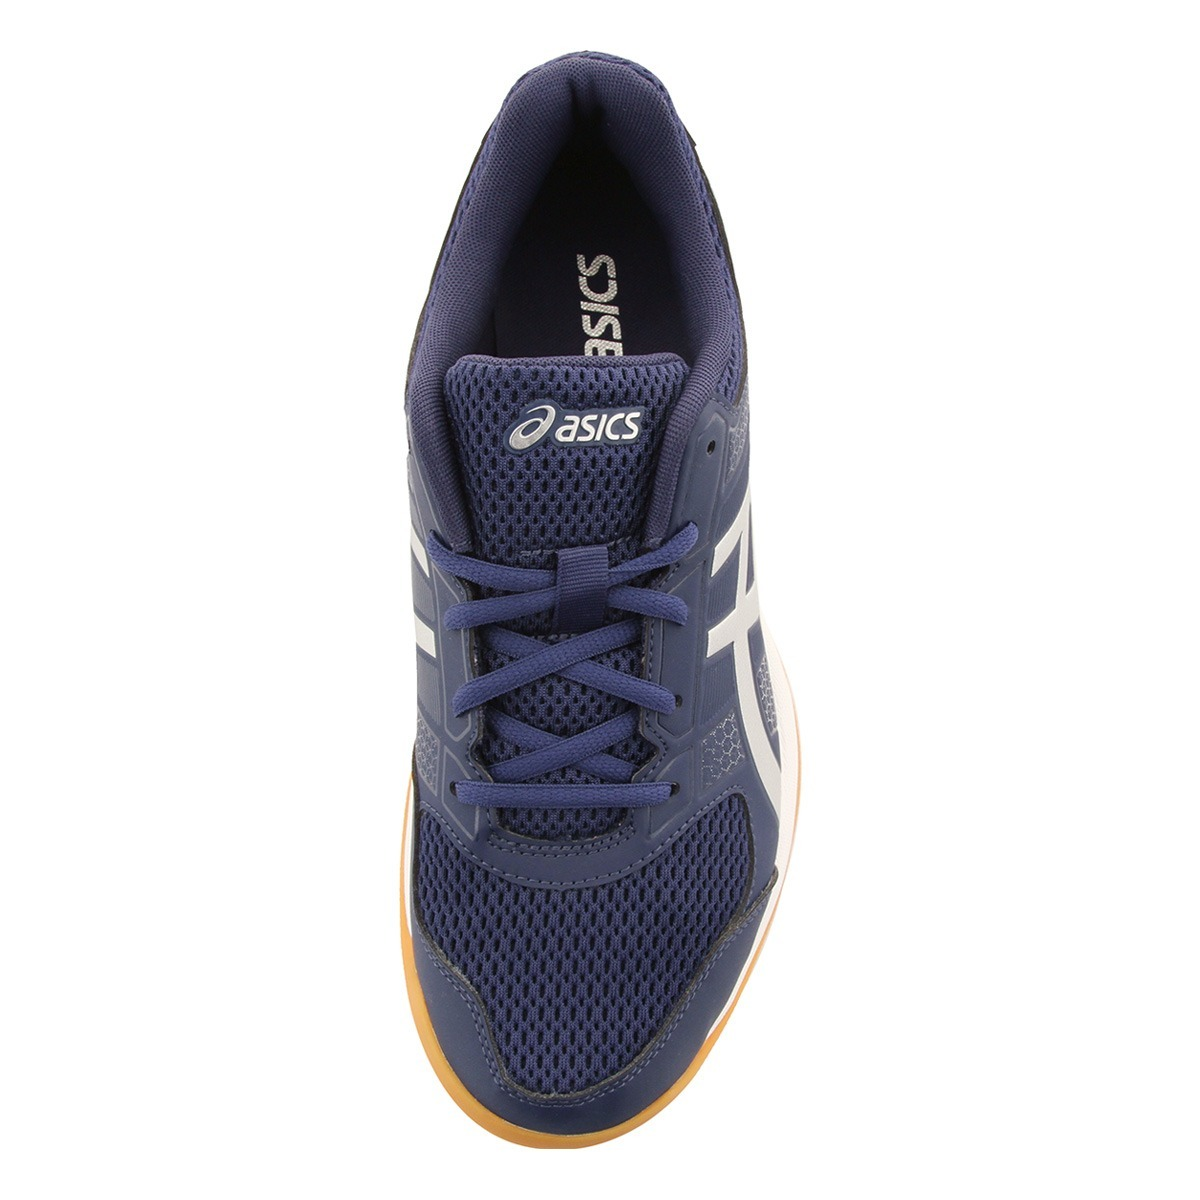 c9c93561c2575 Asics Gel Rocket 8 A Futsal